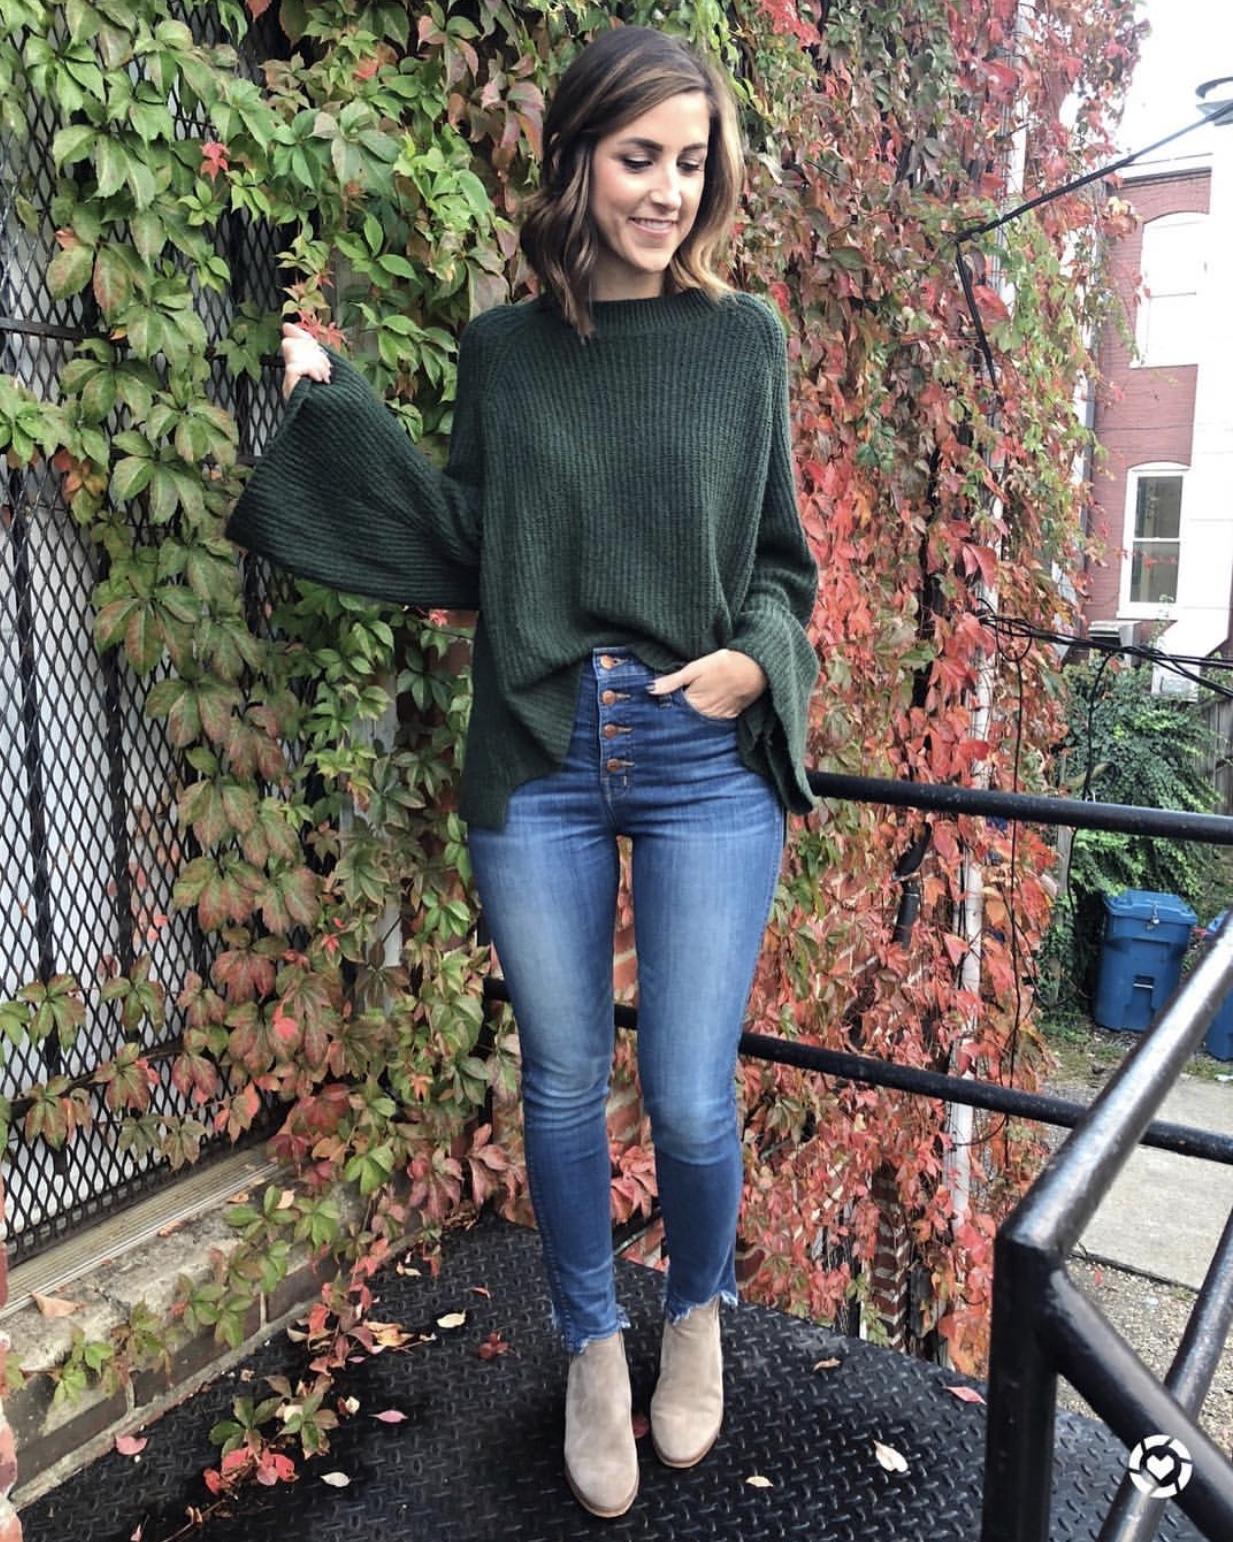 Bell Sleeve Sweater - Instagram Fashion Lately by Washington DC fashion blogger Cobalt Chronicles